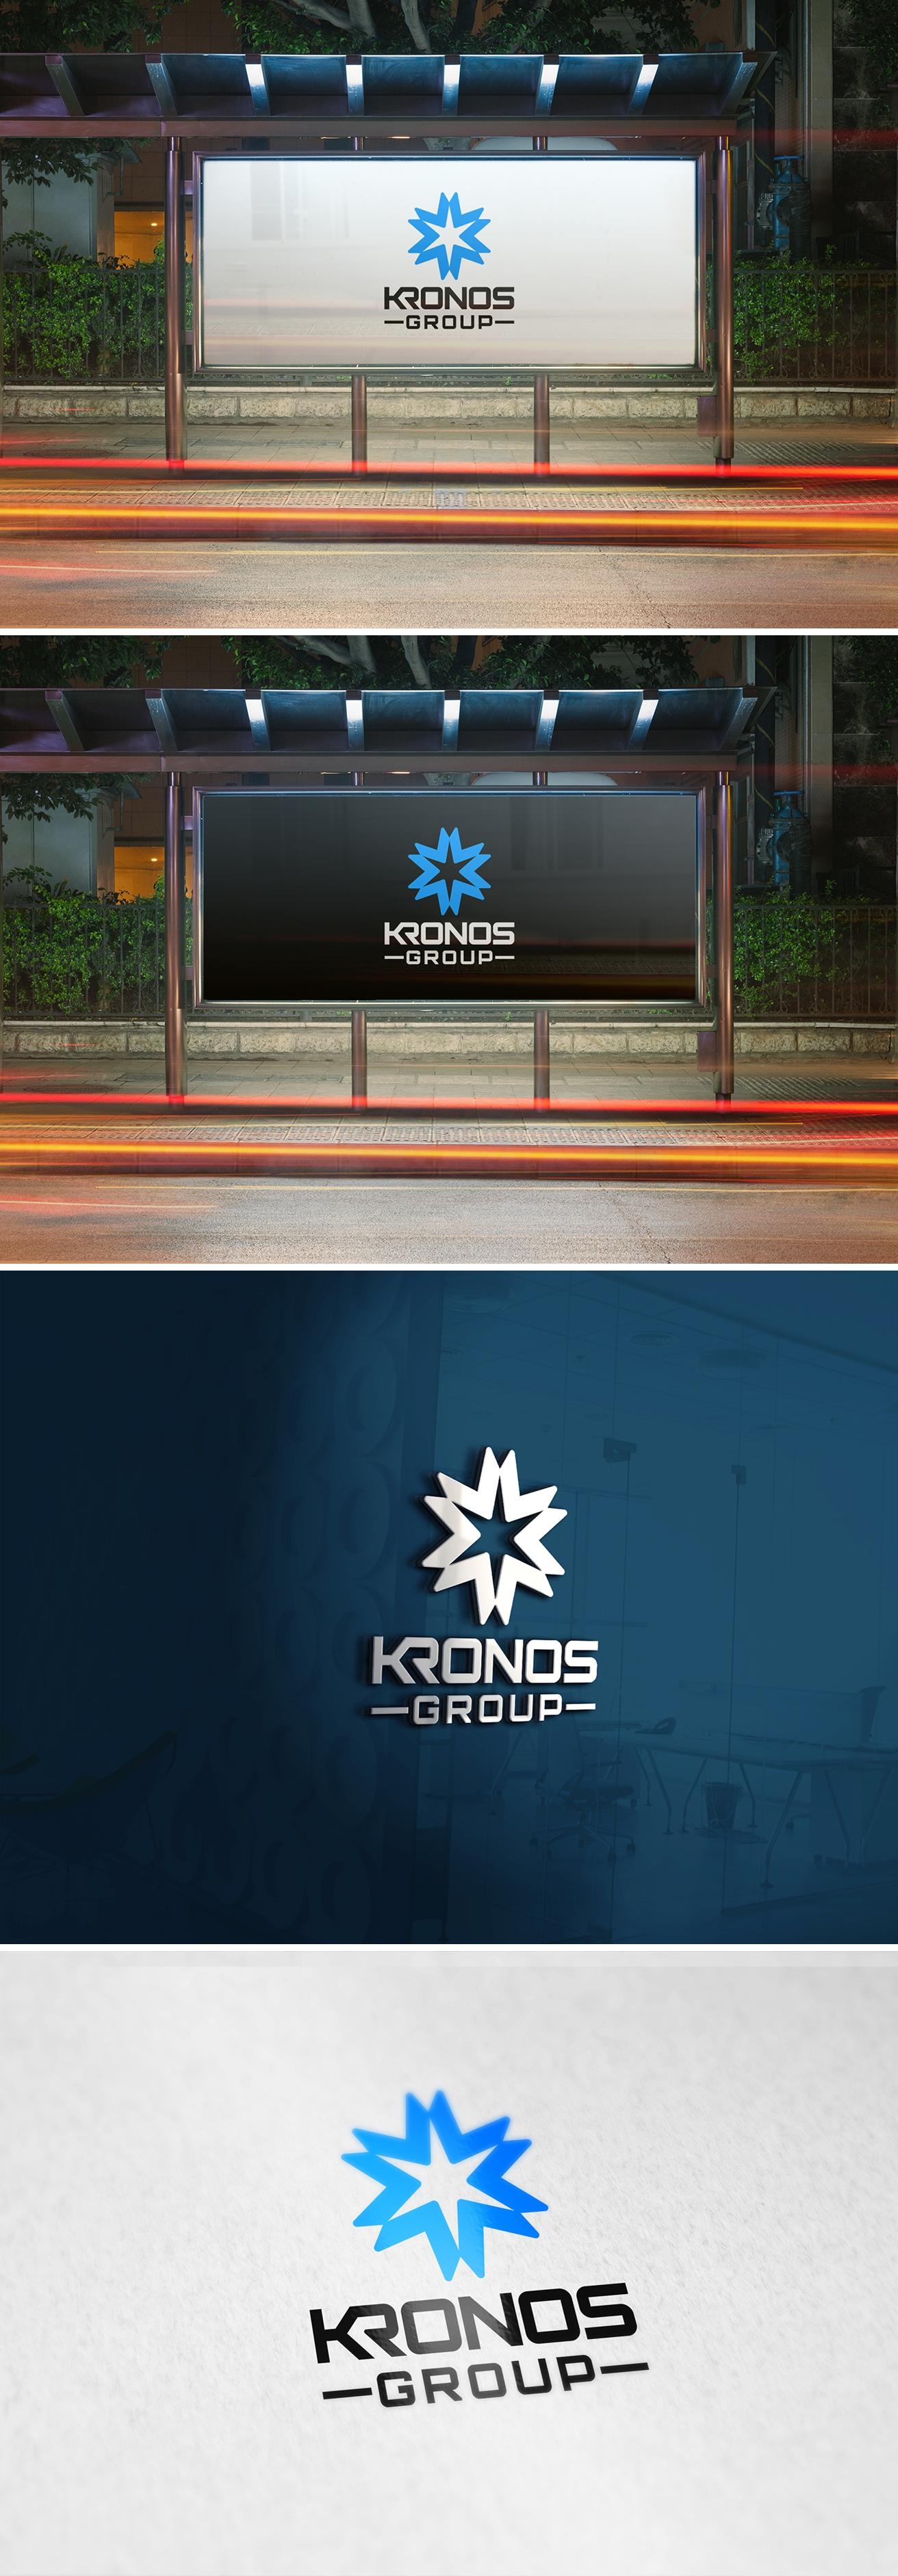 Разработать логотип KRONOS фото f_4355fafaa8184f2f.jpg